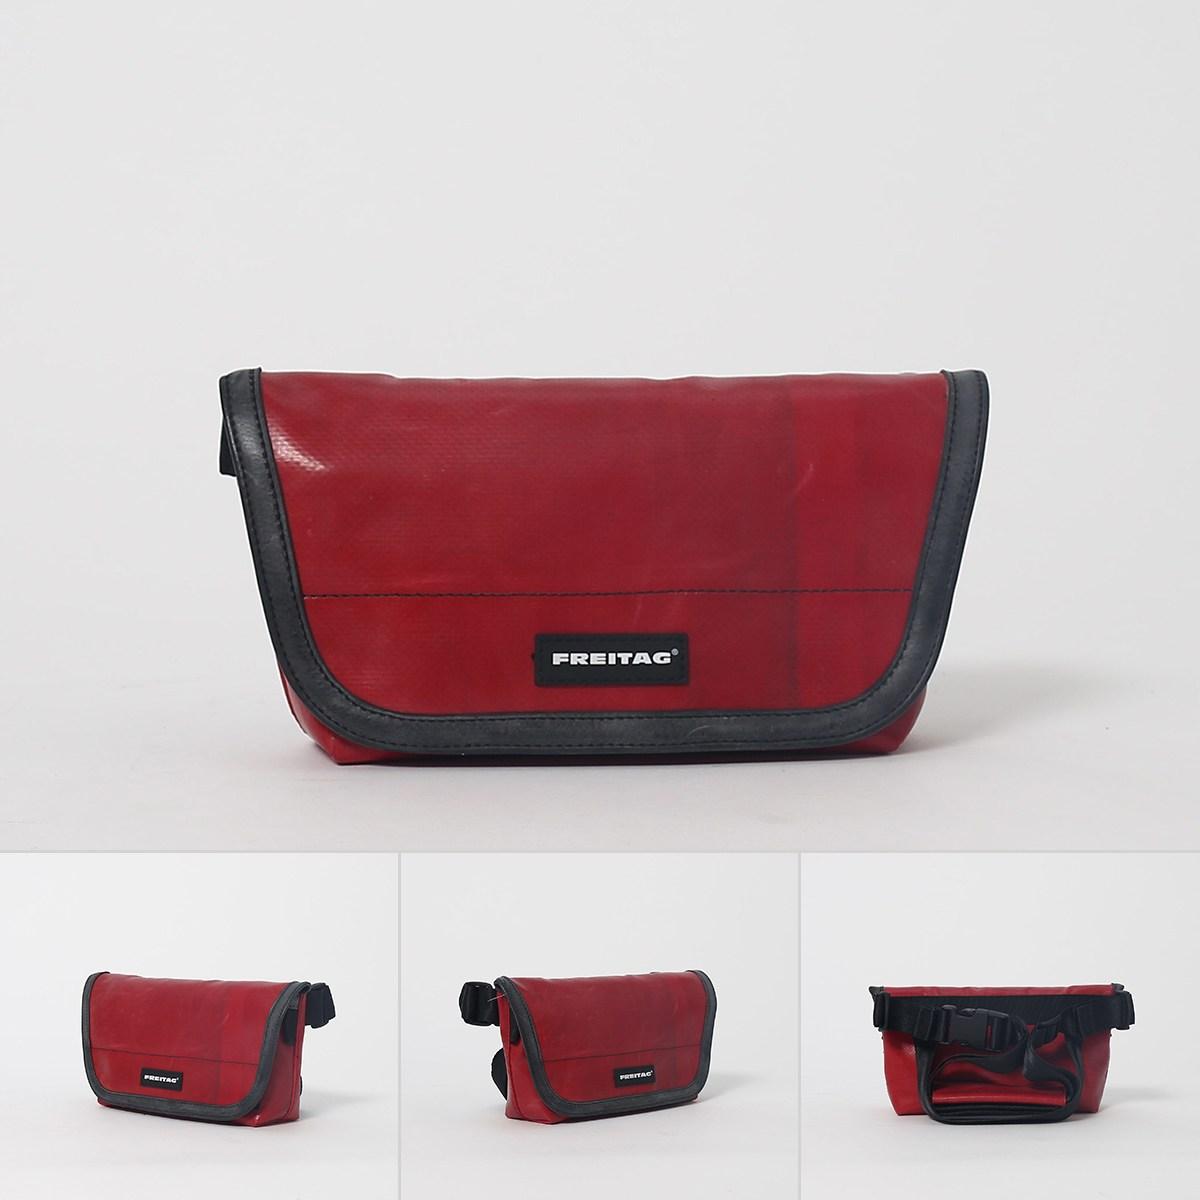 FREITAG F153 JAMIE 메신저 백 캐주얼 허리 가방 어깨 메신저 백 스위스 환경 보, 상세내용참조